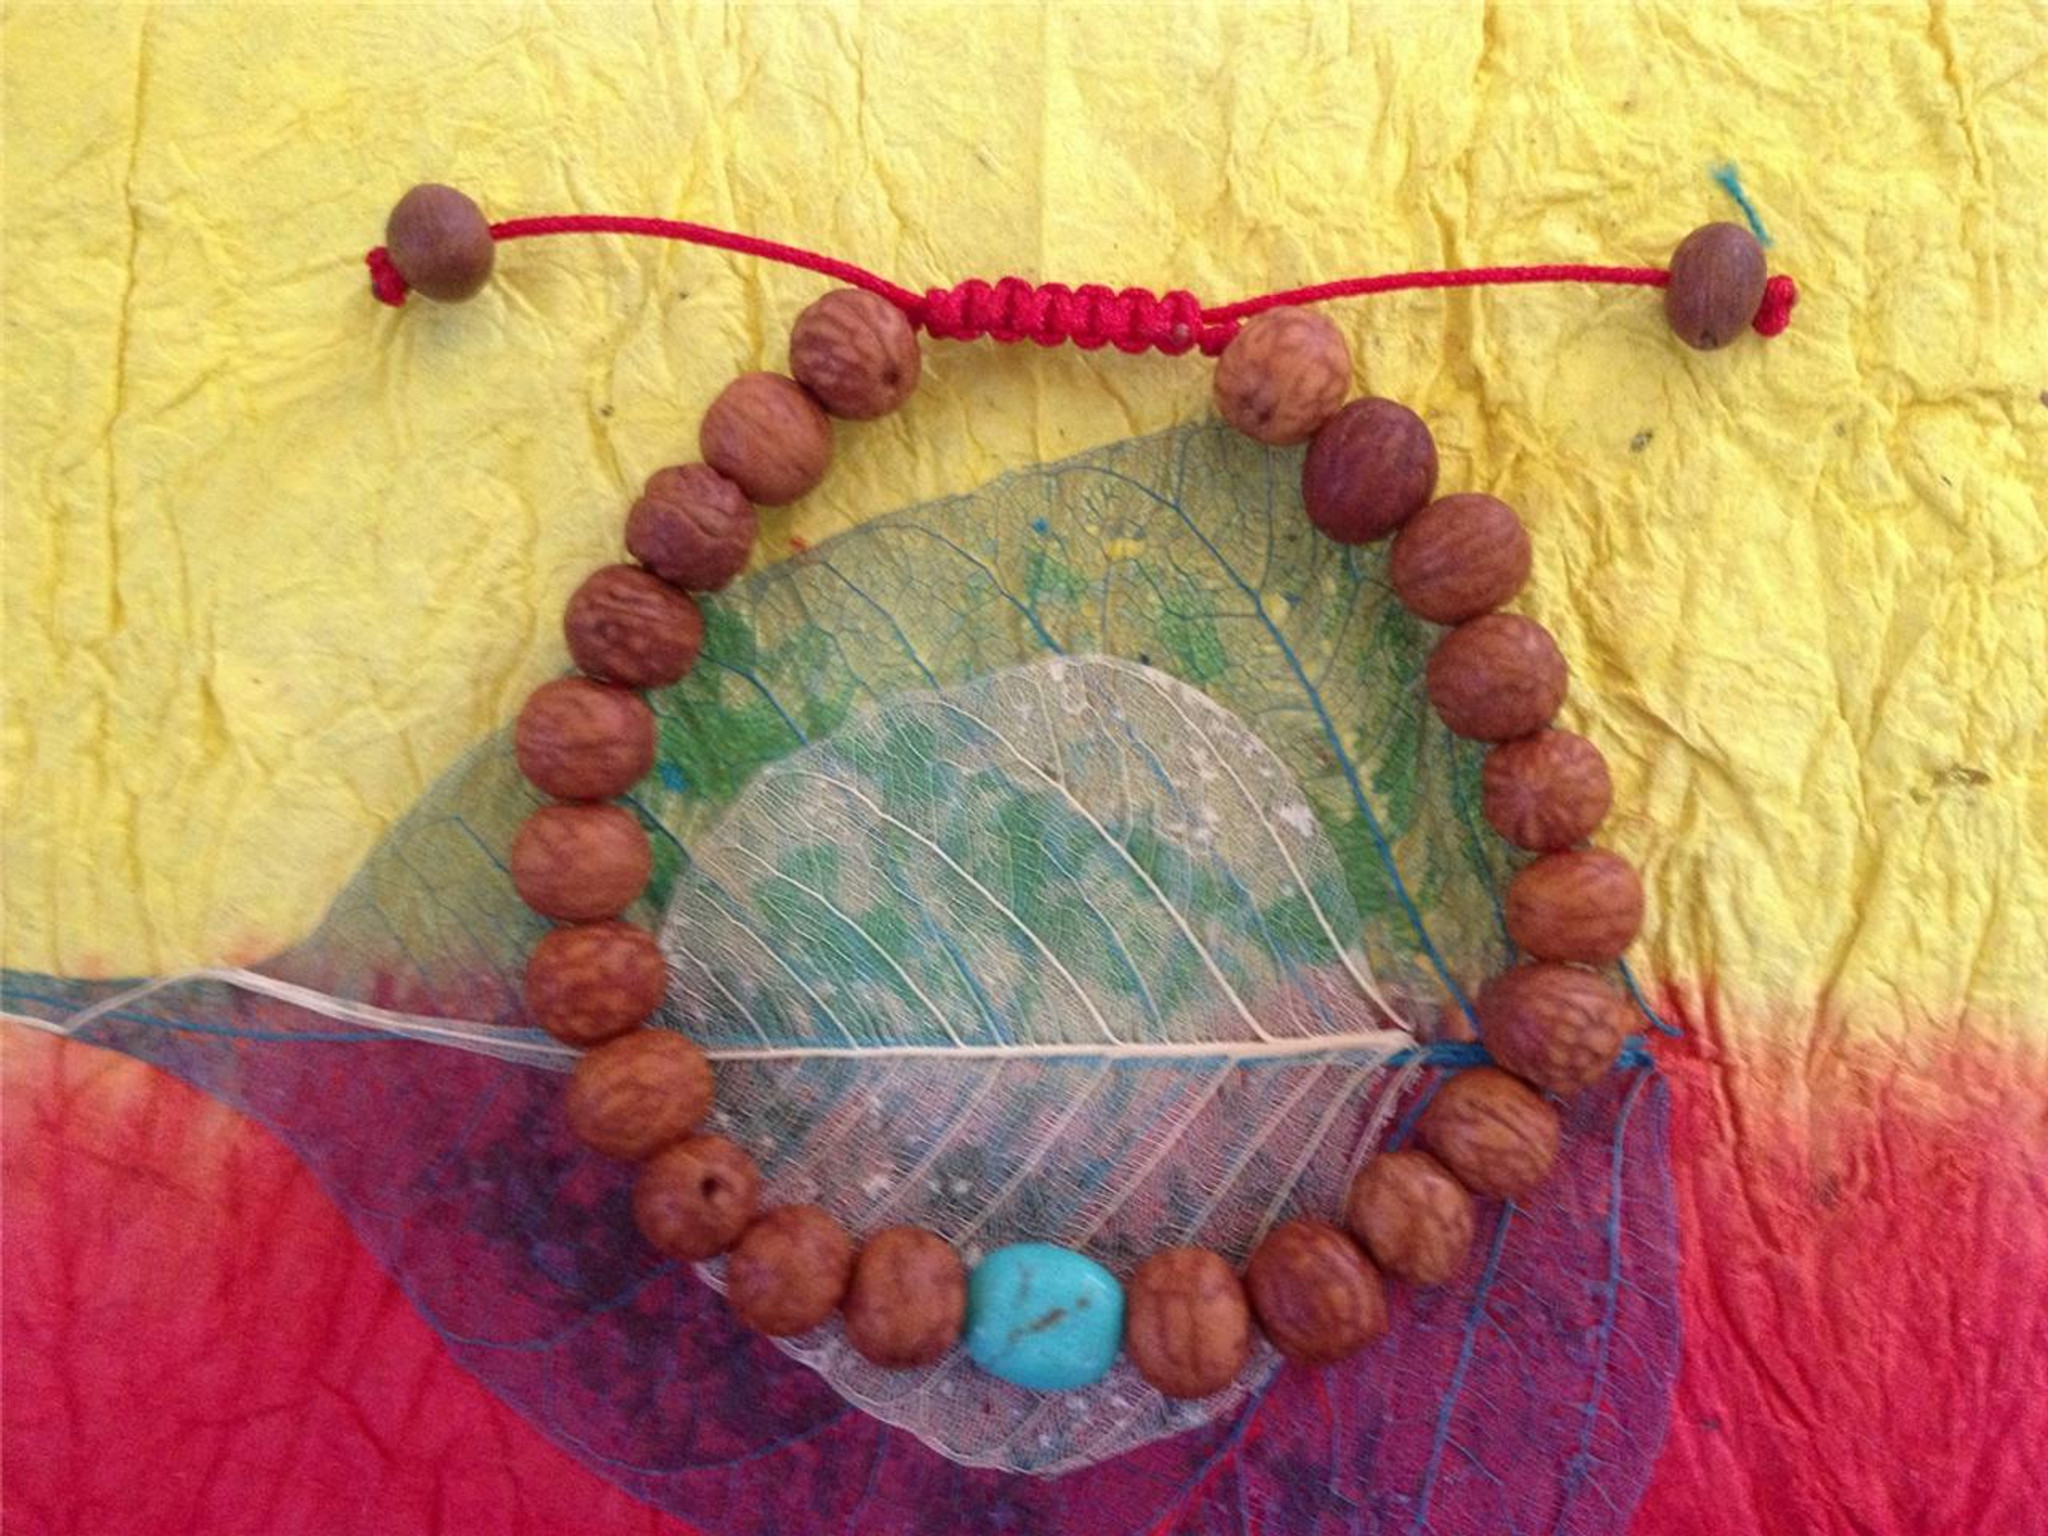 Tibetan Mala Raktu Seed Wrist Mala Bracelet With